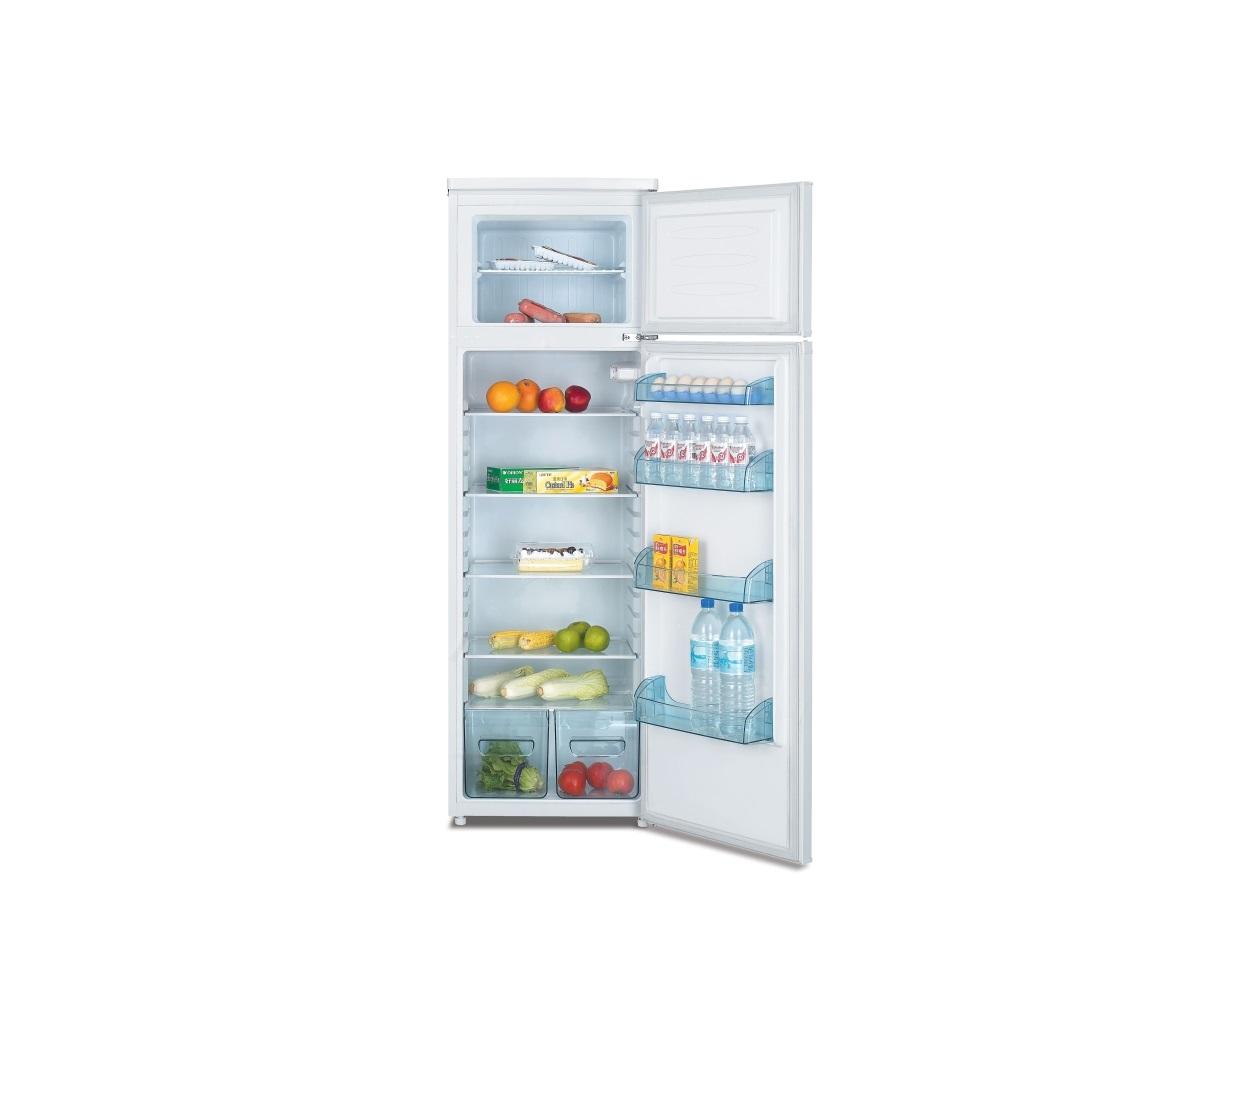 LG Top Freezer Refrigerator 268L GCS262SV